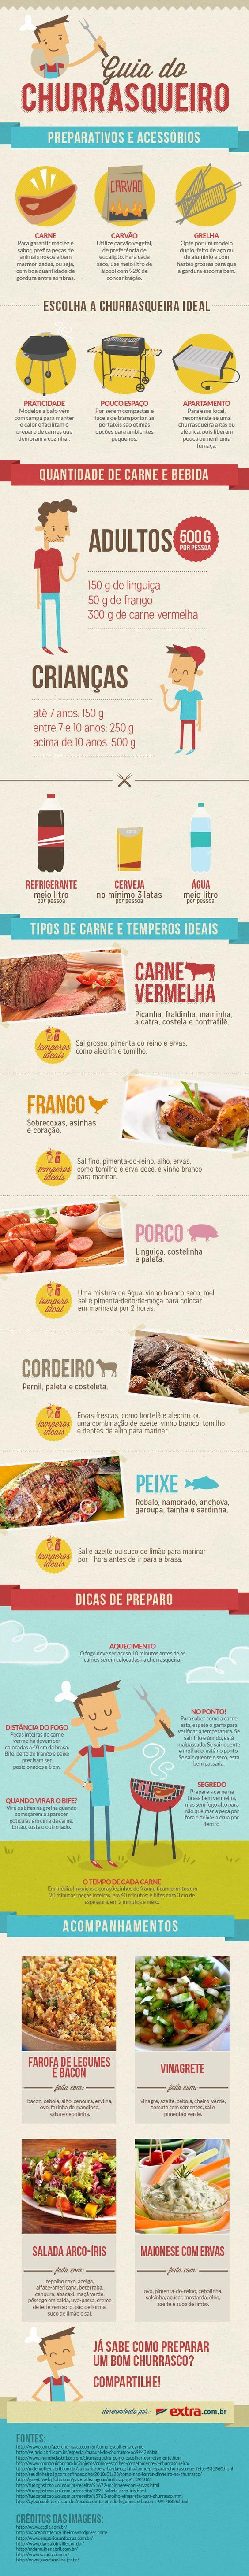 Infográfico – Guia definitivo do churrasco perfeito